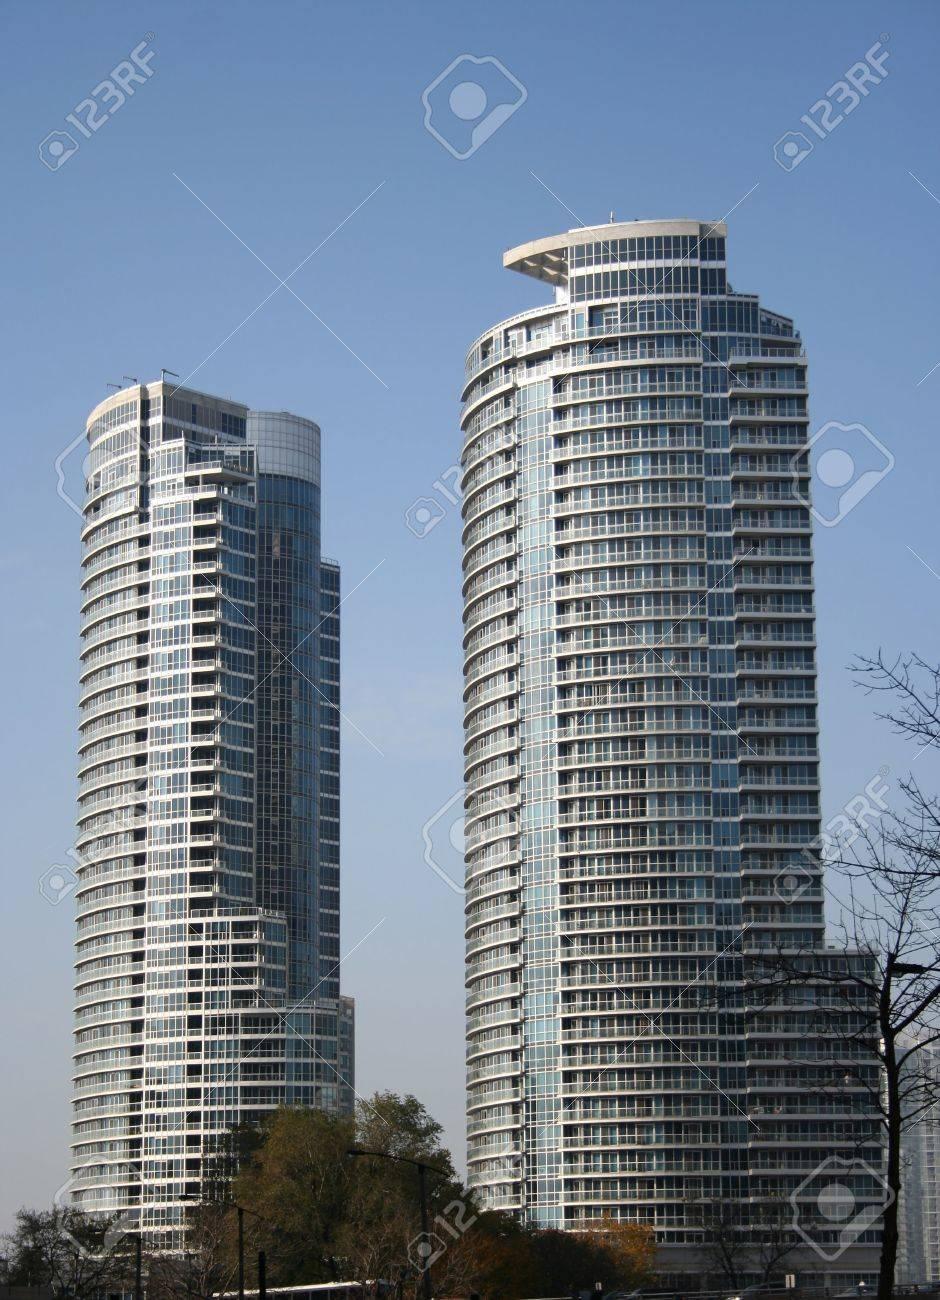 Fancy Apartment Building luxury apartment buildings lakeshore condos toronto canada stock